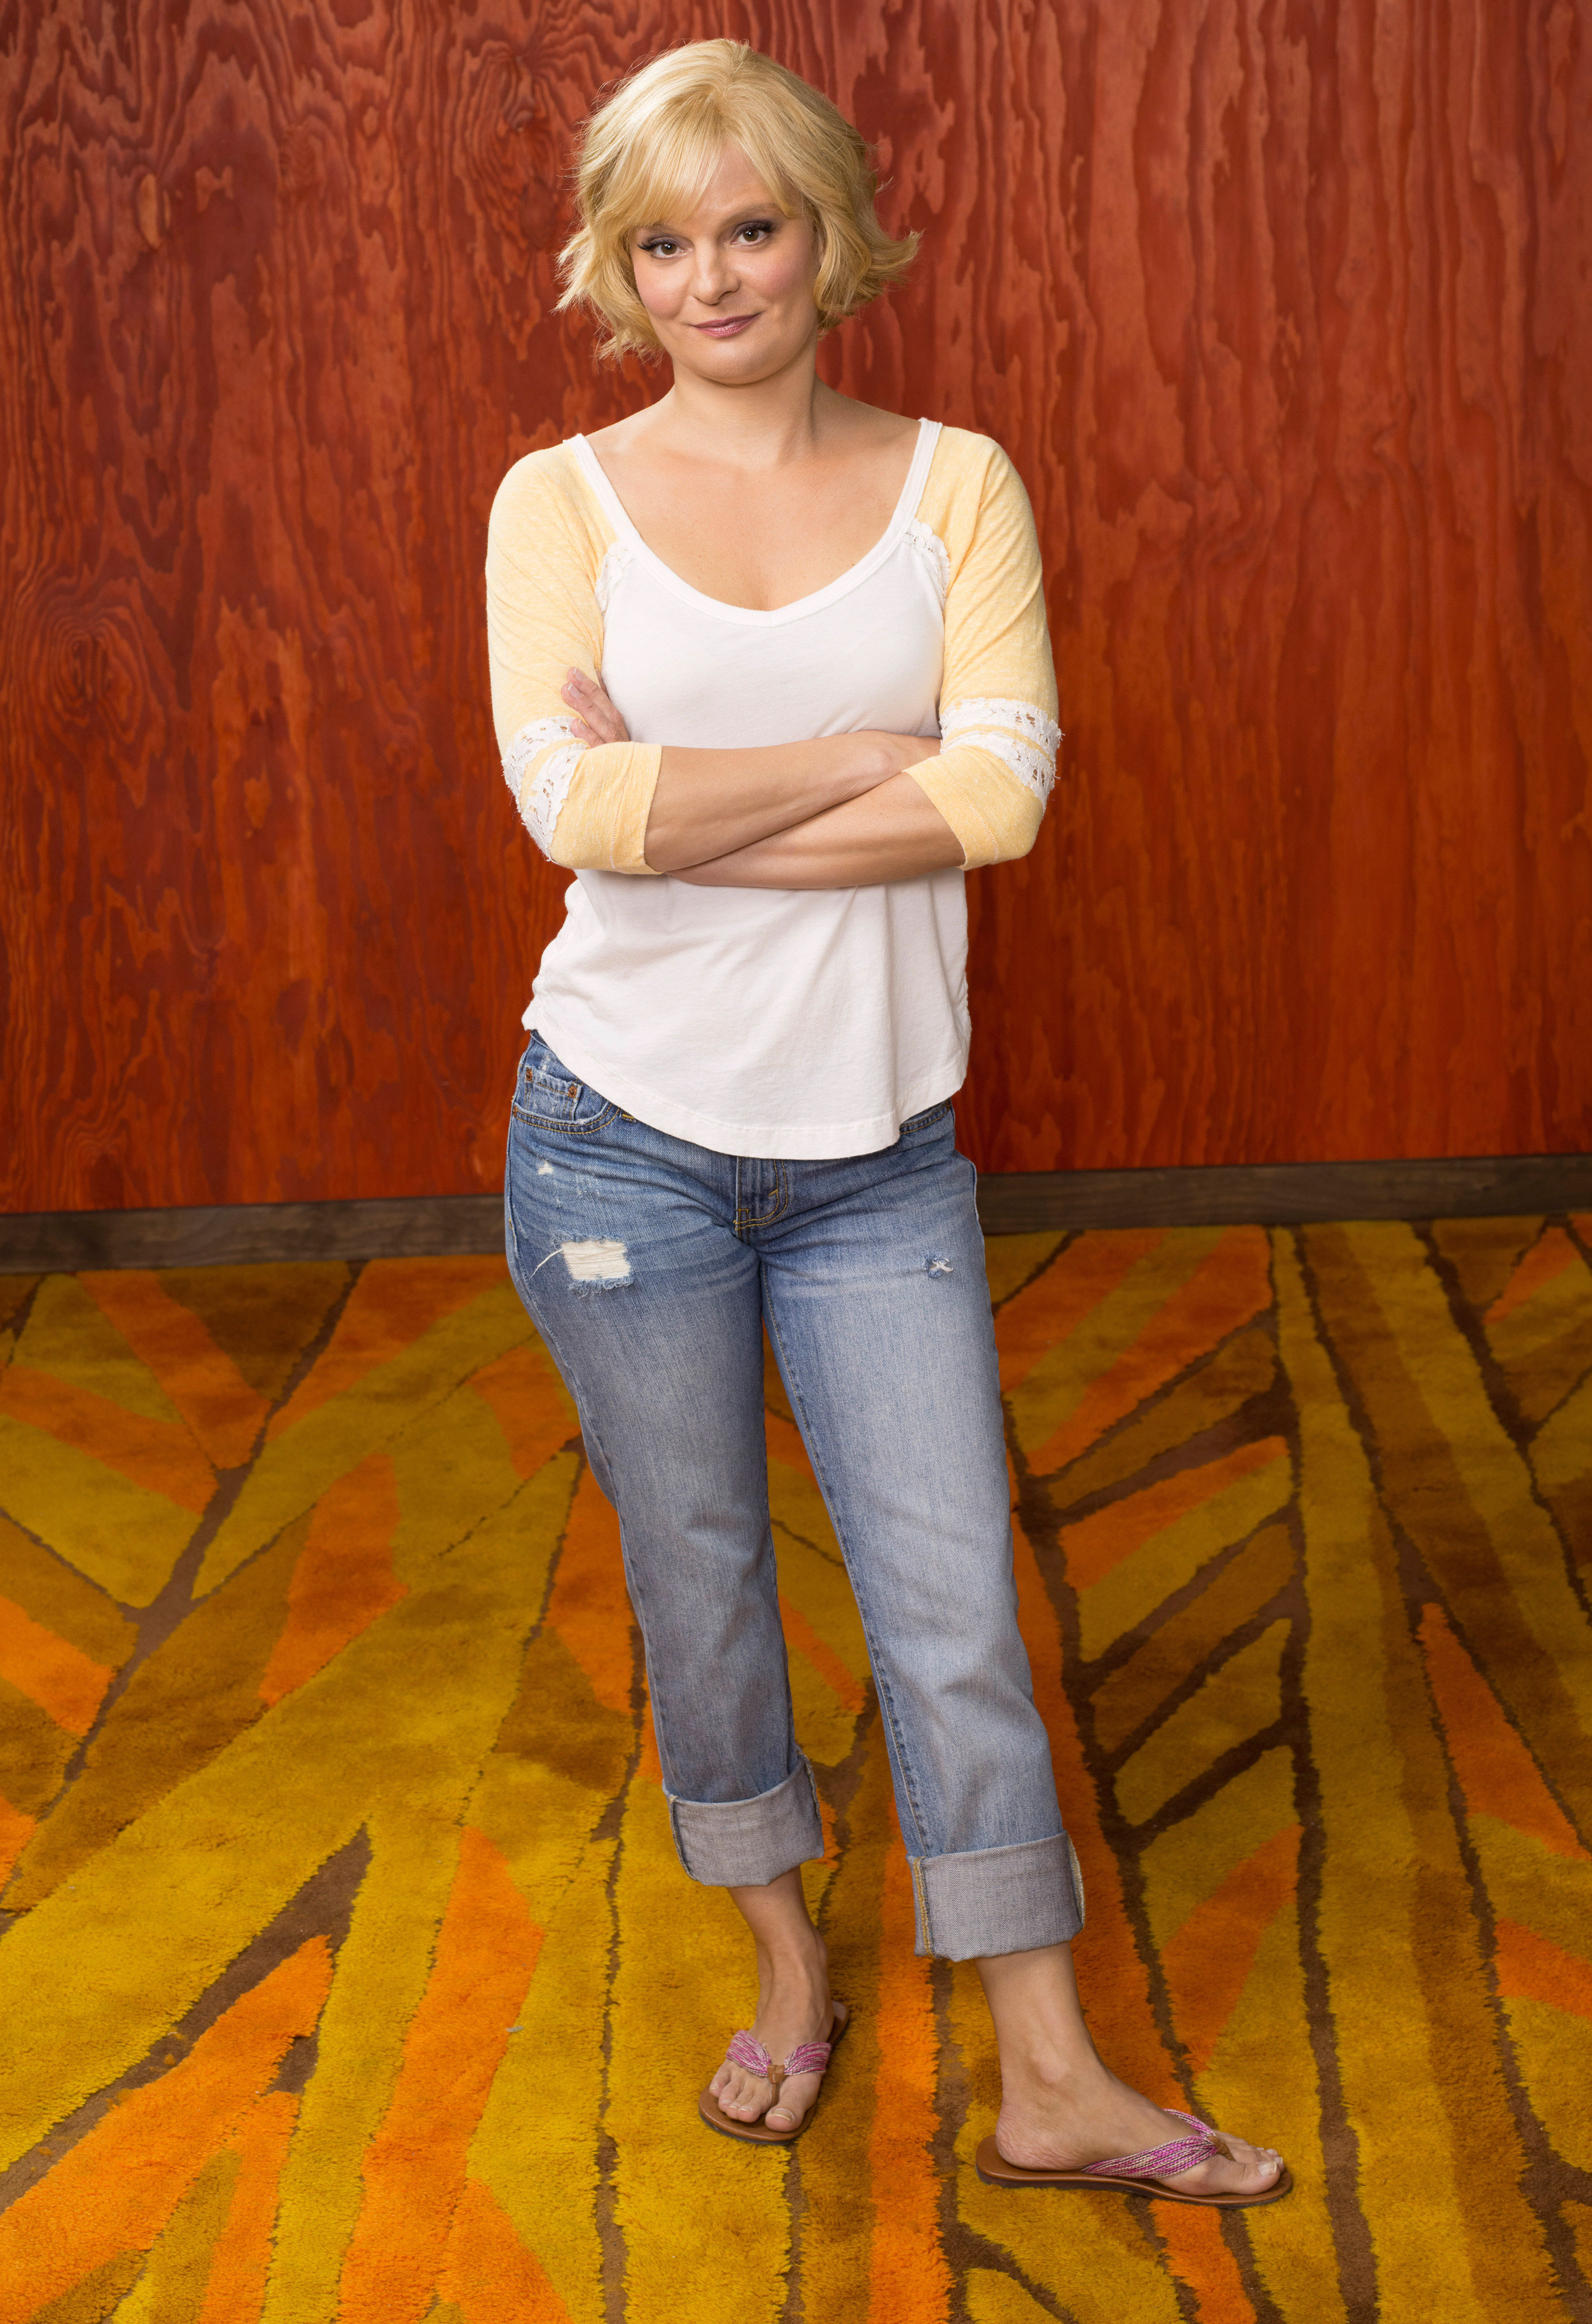 Who is vanessa hudgens dating july 2012 5